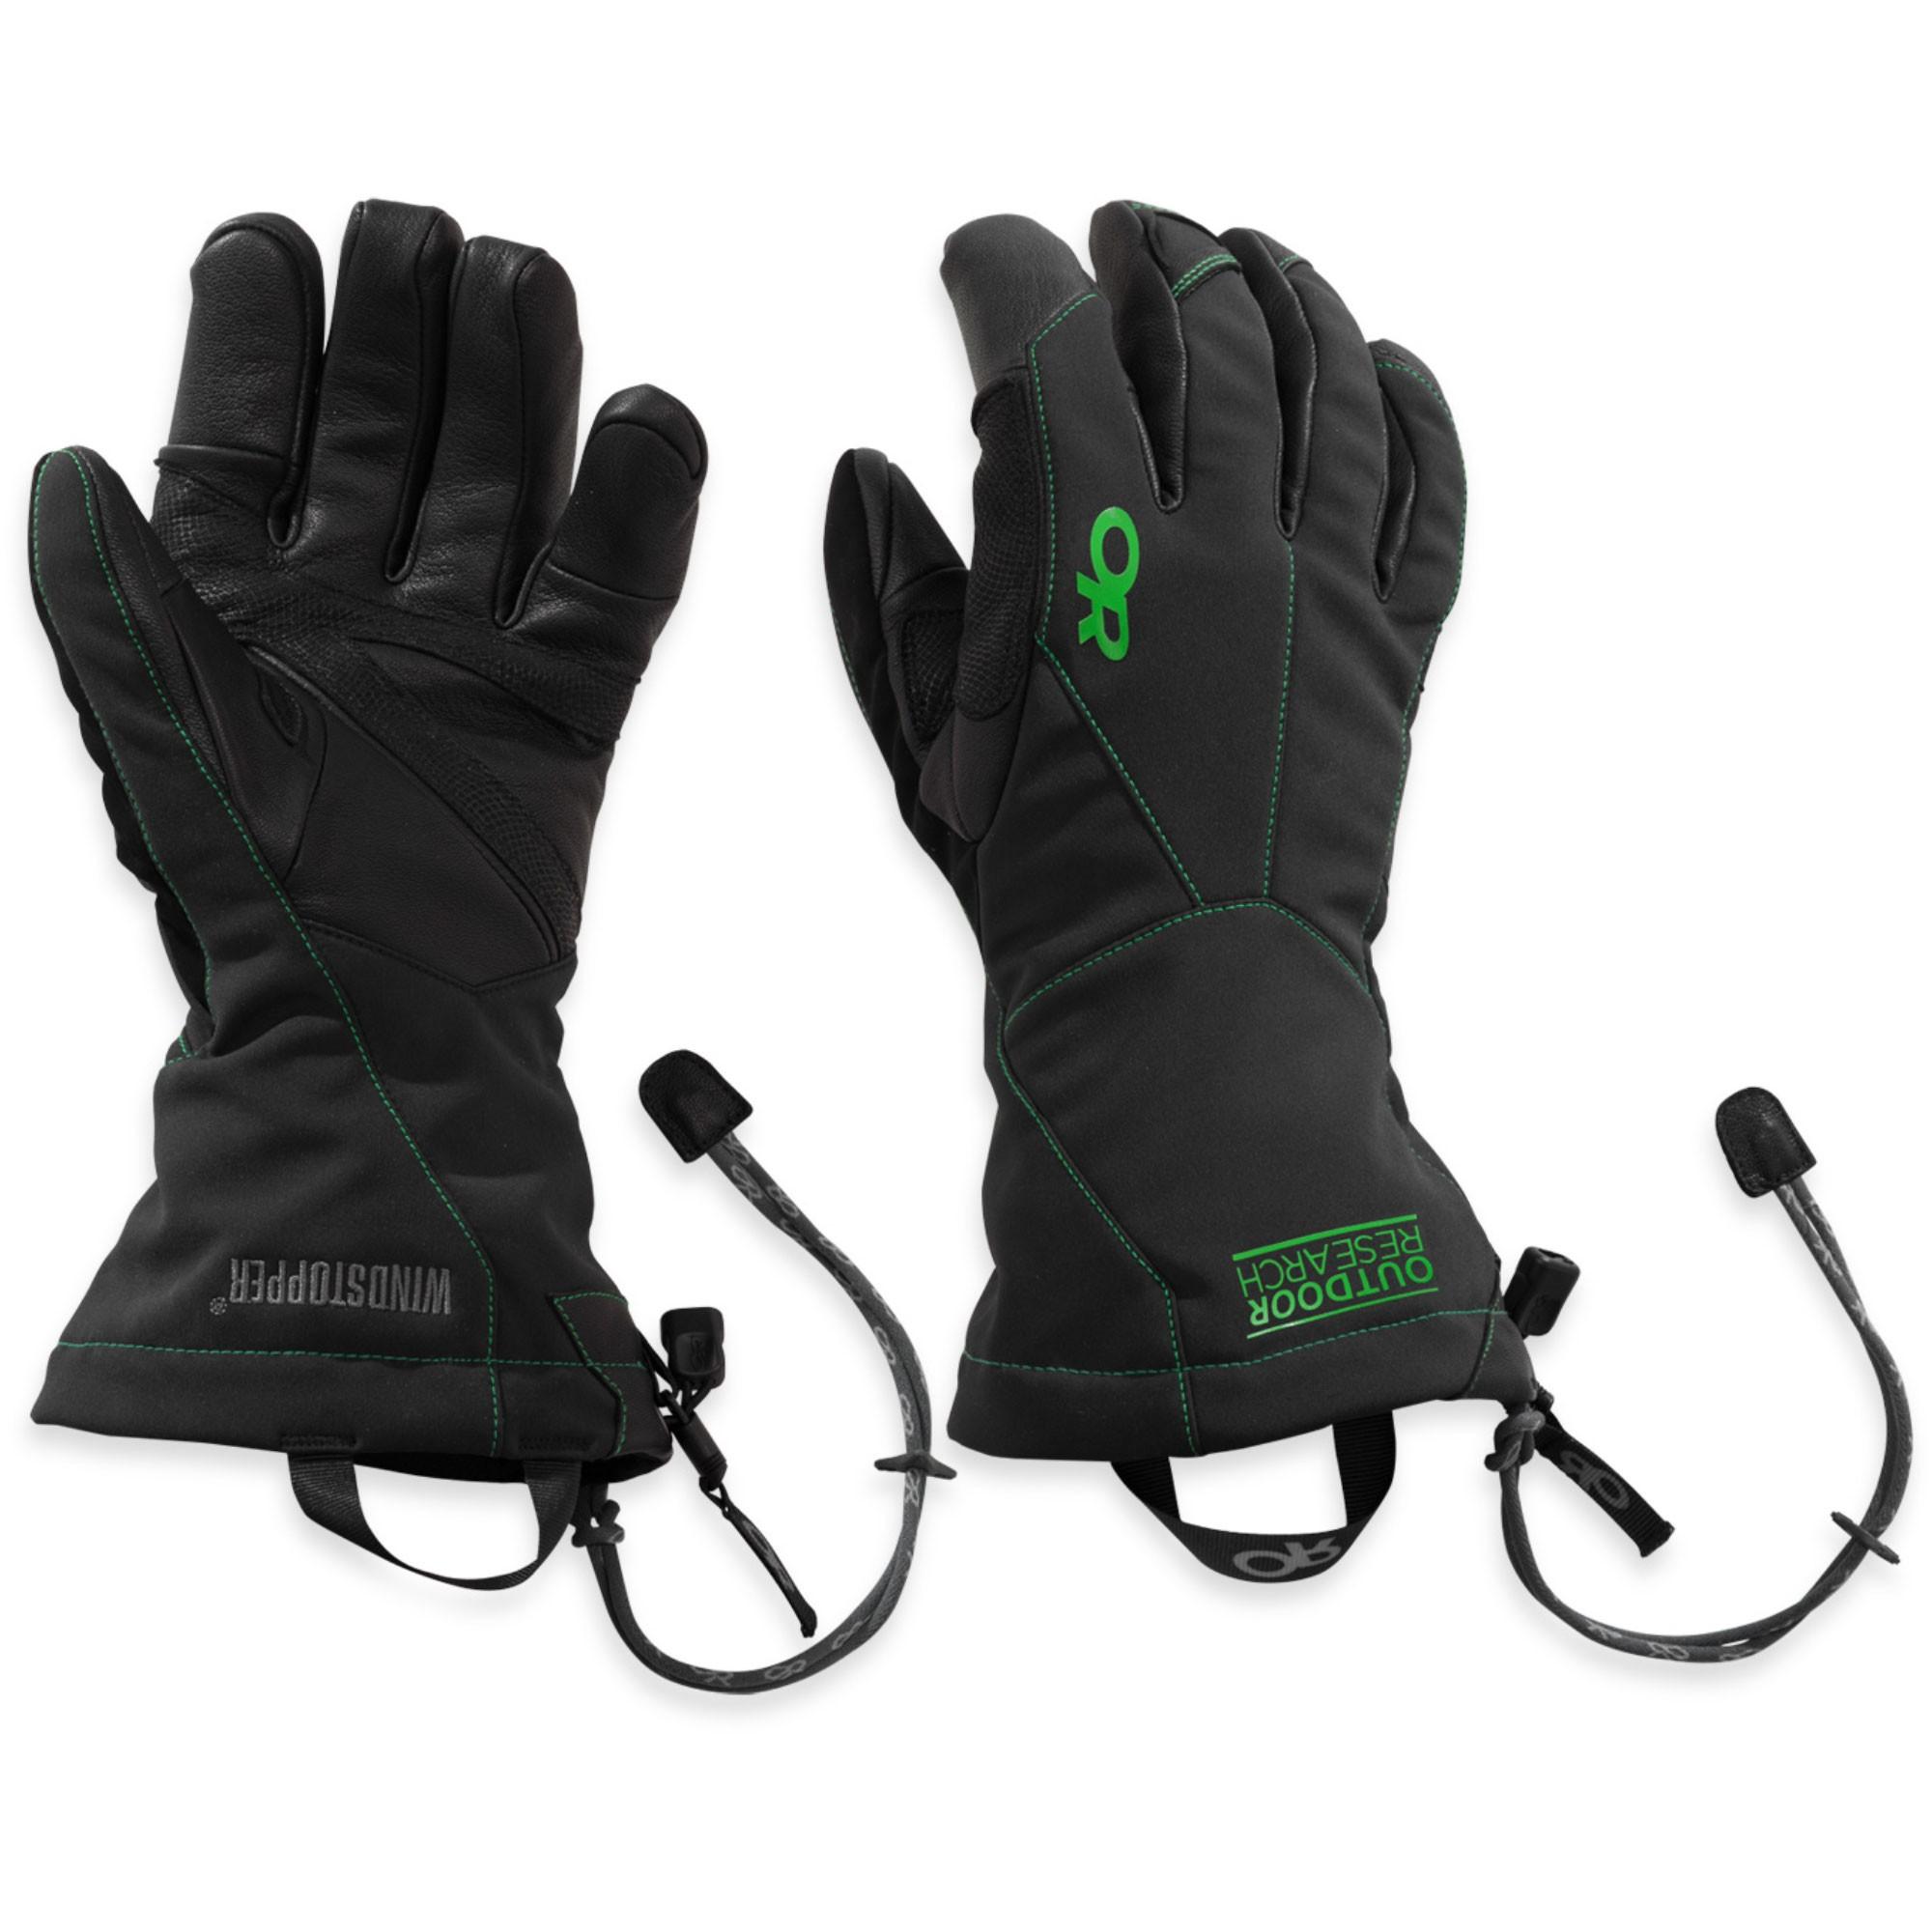 OUTDOOR RESEARCH - Luminary Sensor Gloves